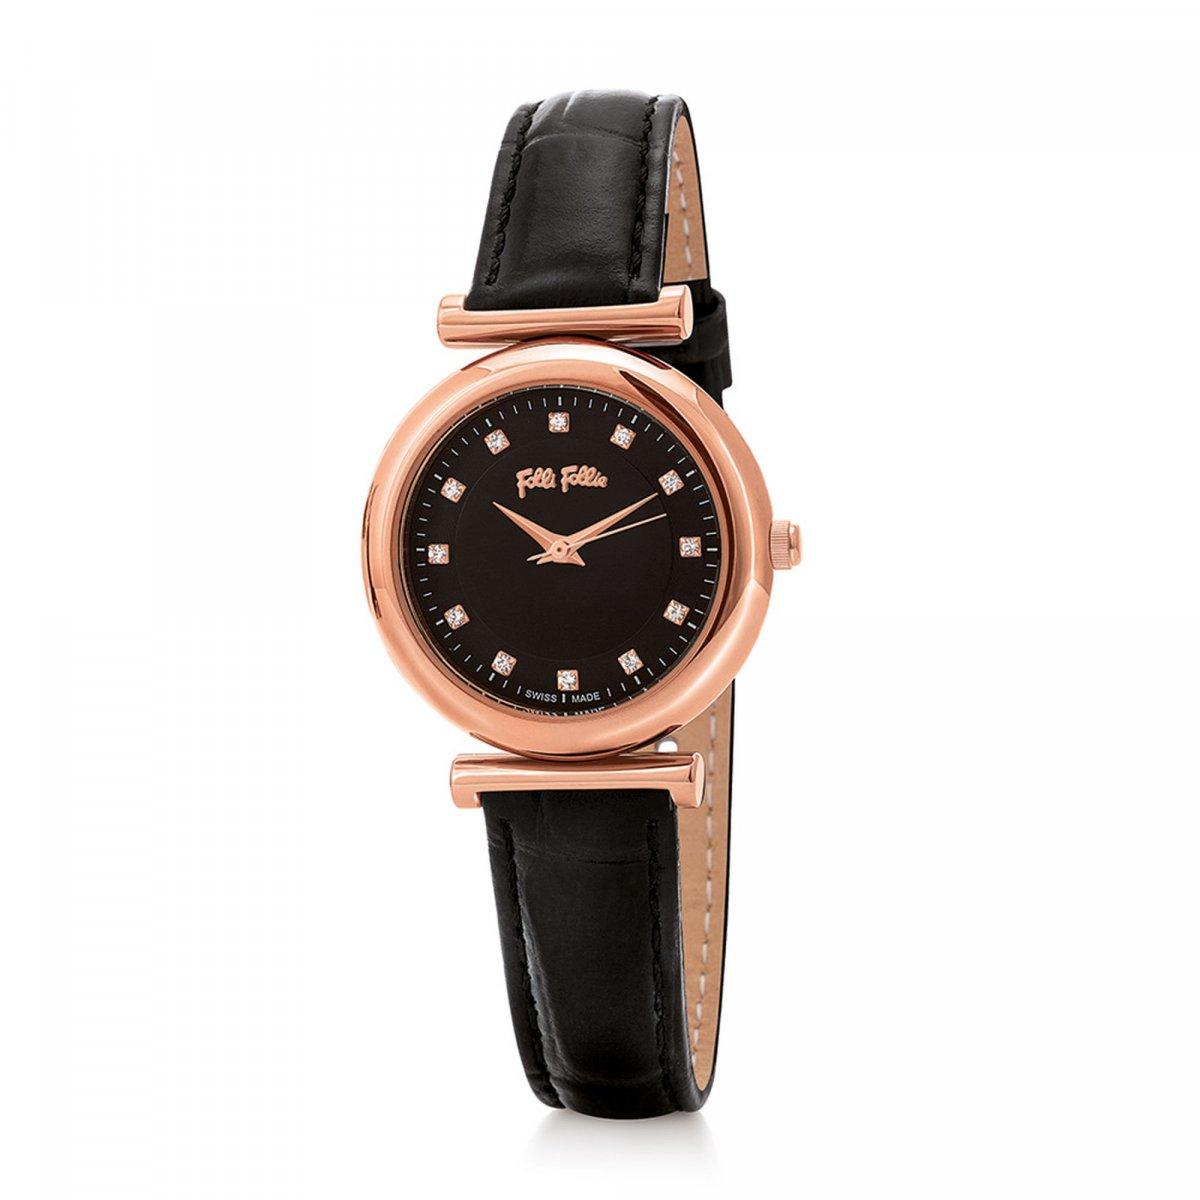 Hodinky FOLLI FOLLIE Sparkle Chic Small Case Leather Watch